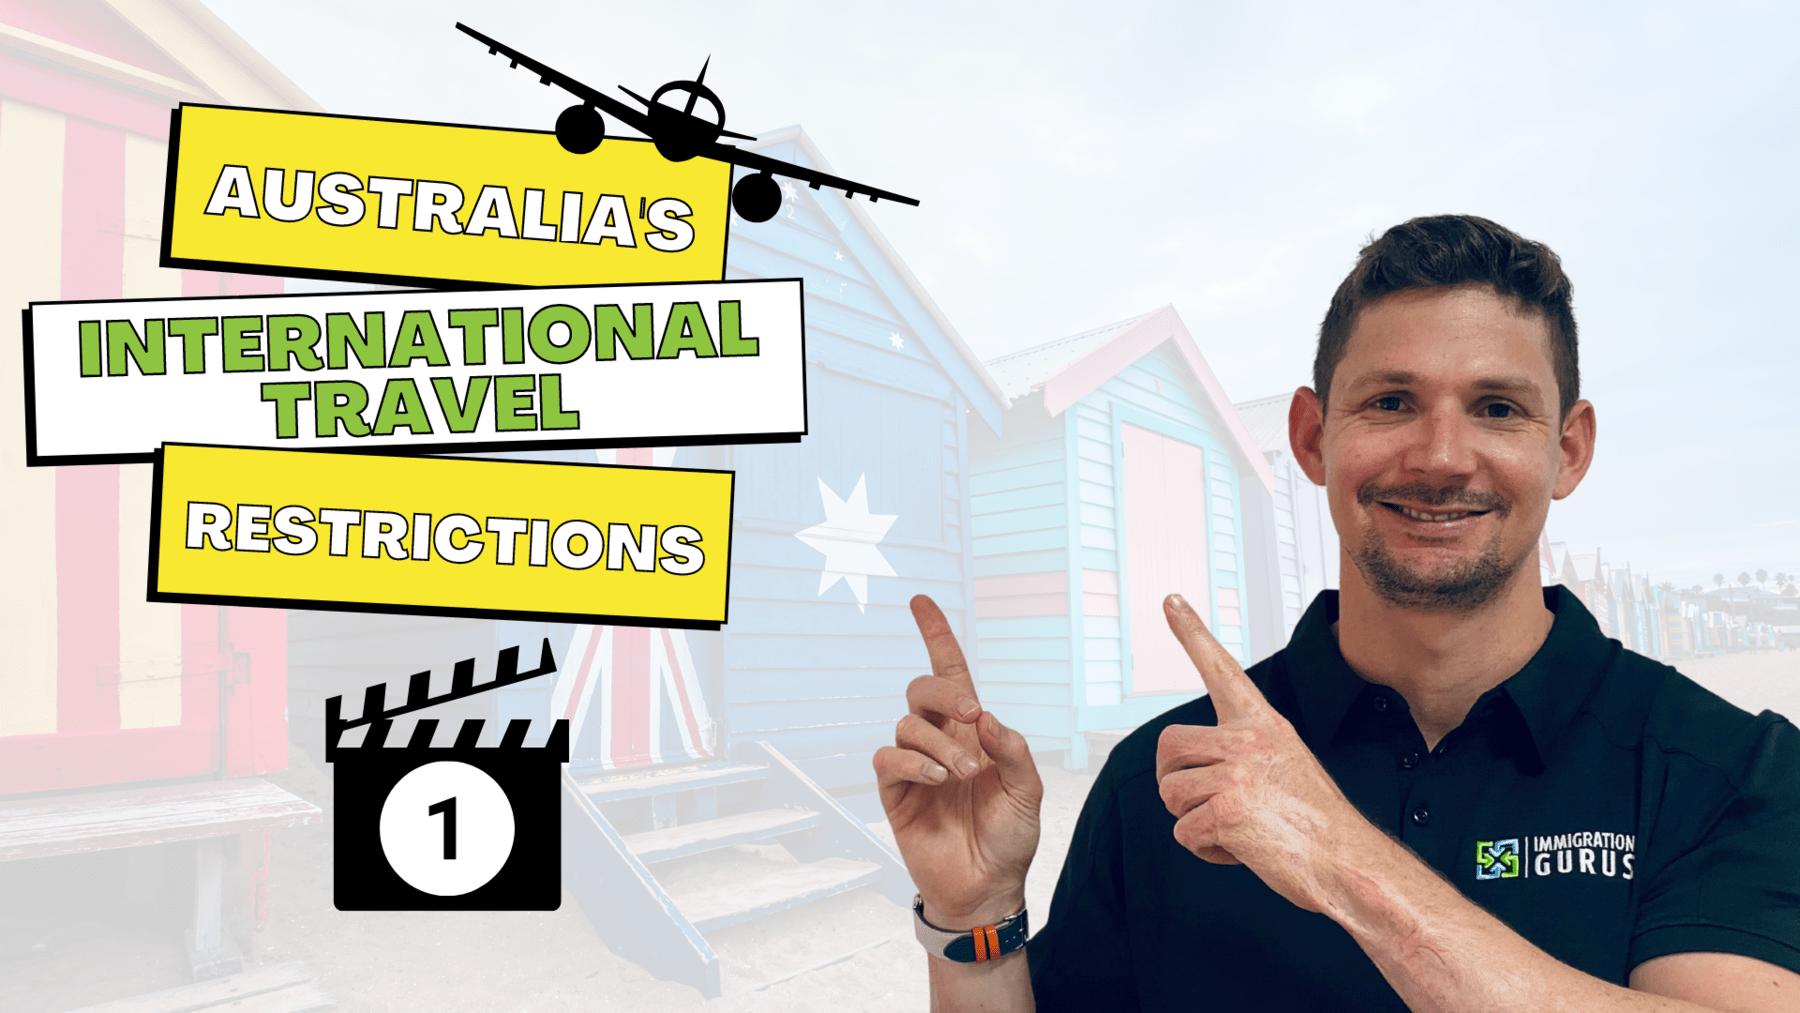 Australia-travel-restrictions-covid19